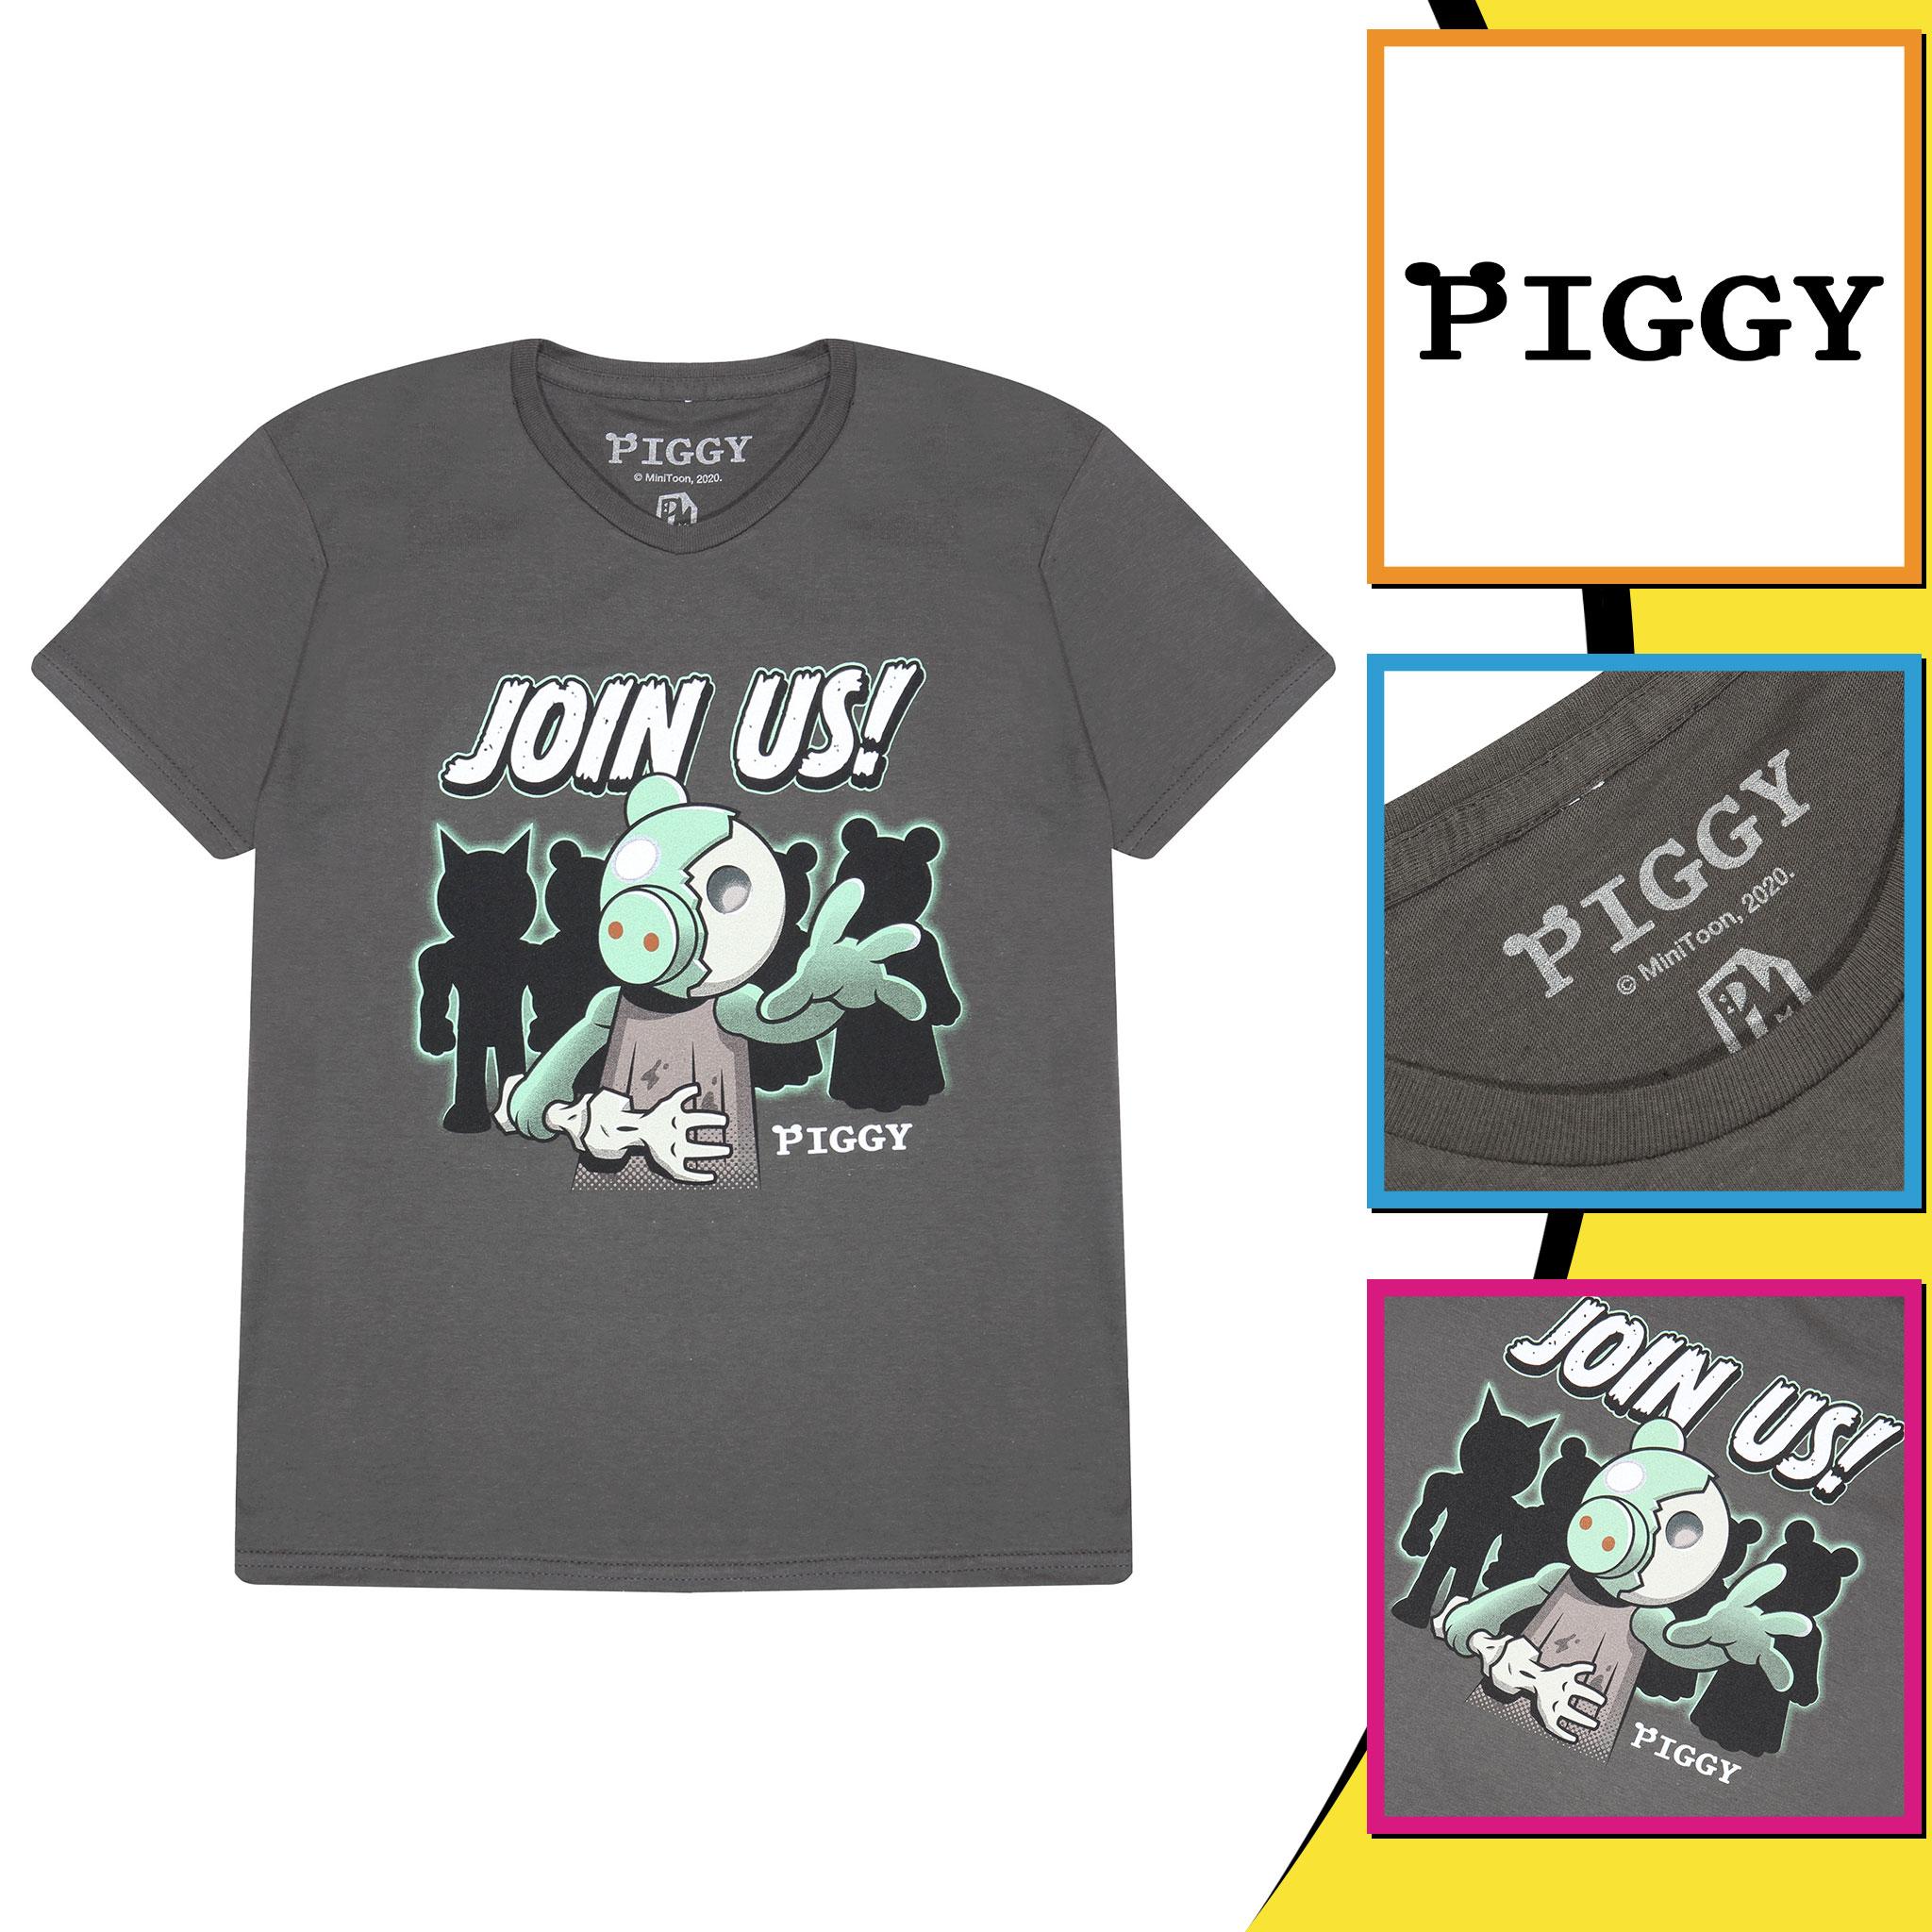 miniature 8 - Boys Piggy T Shirt Zombie Join Us Official Grey